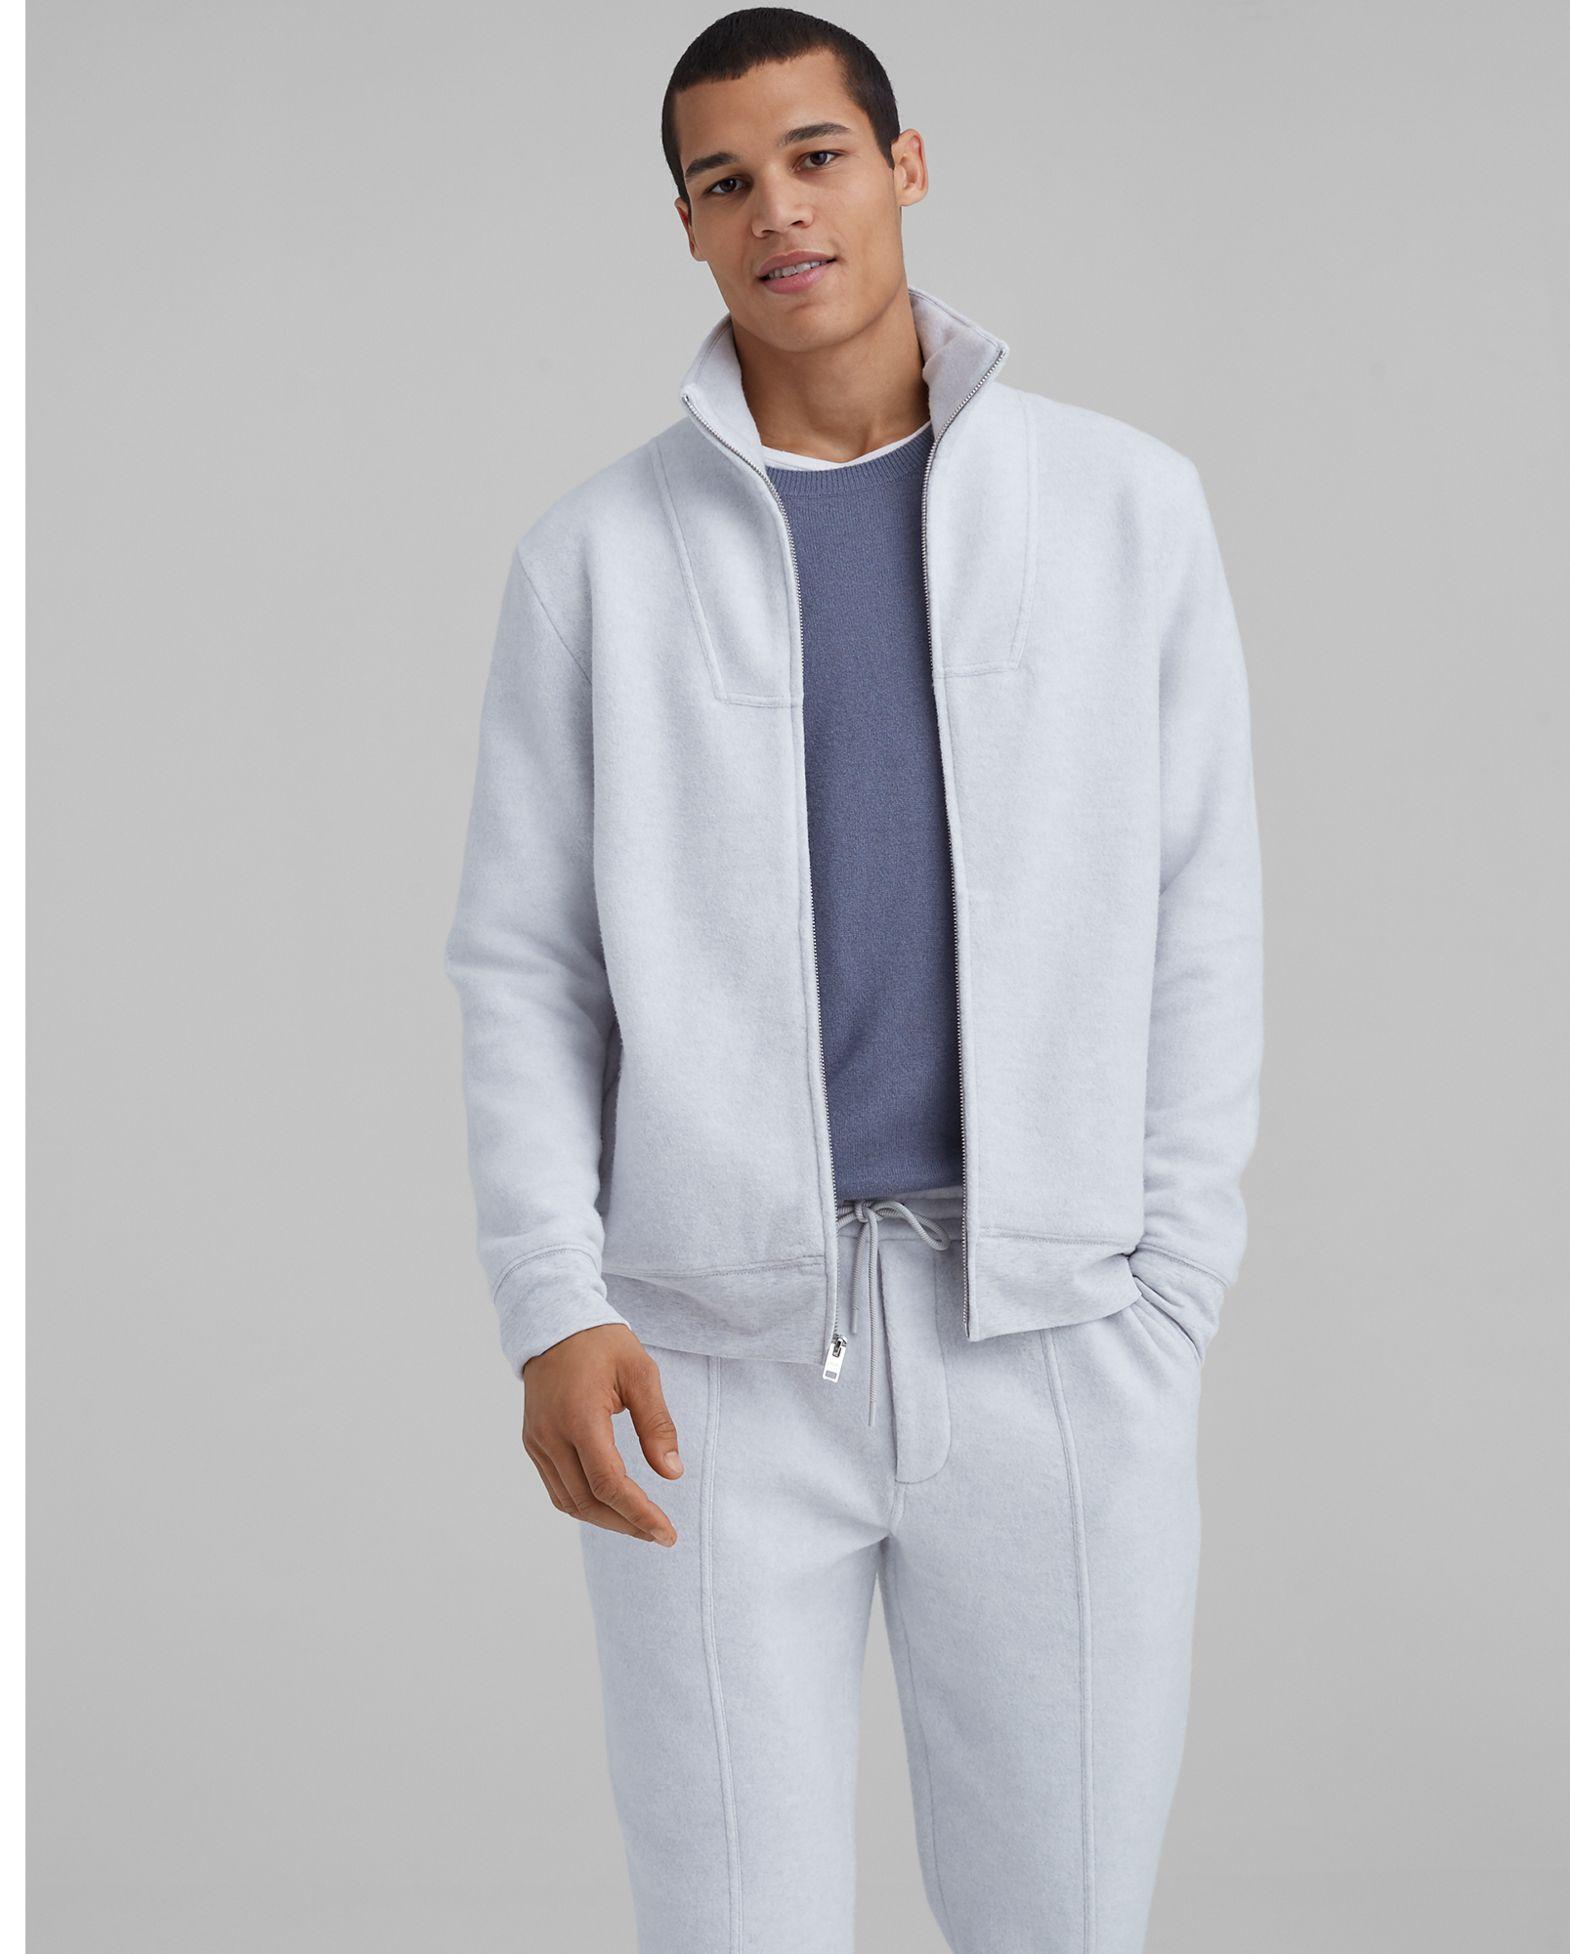 CLUB MONACO Brushed Full-Zip Sweater